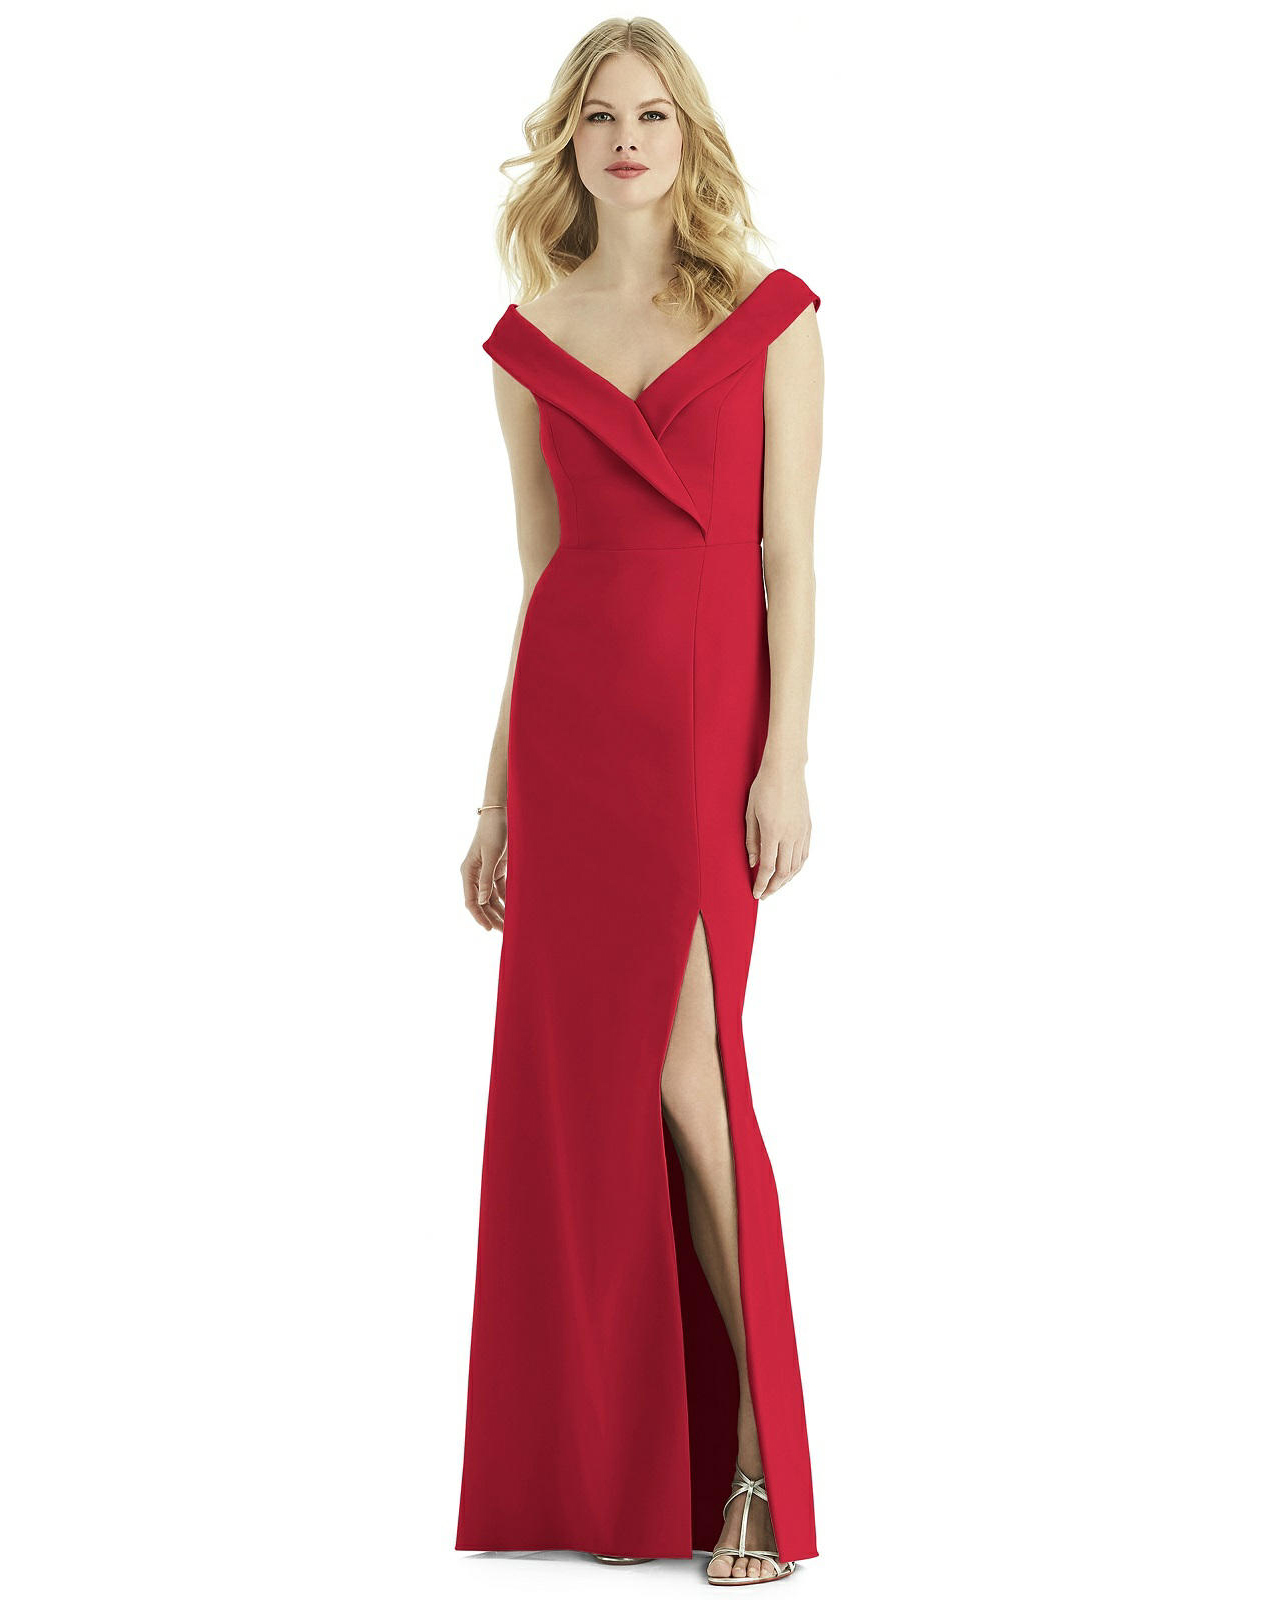 floor length Crepe Dress in Flame red